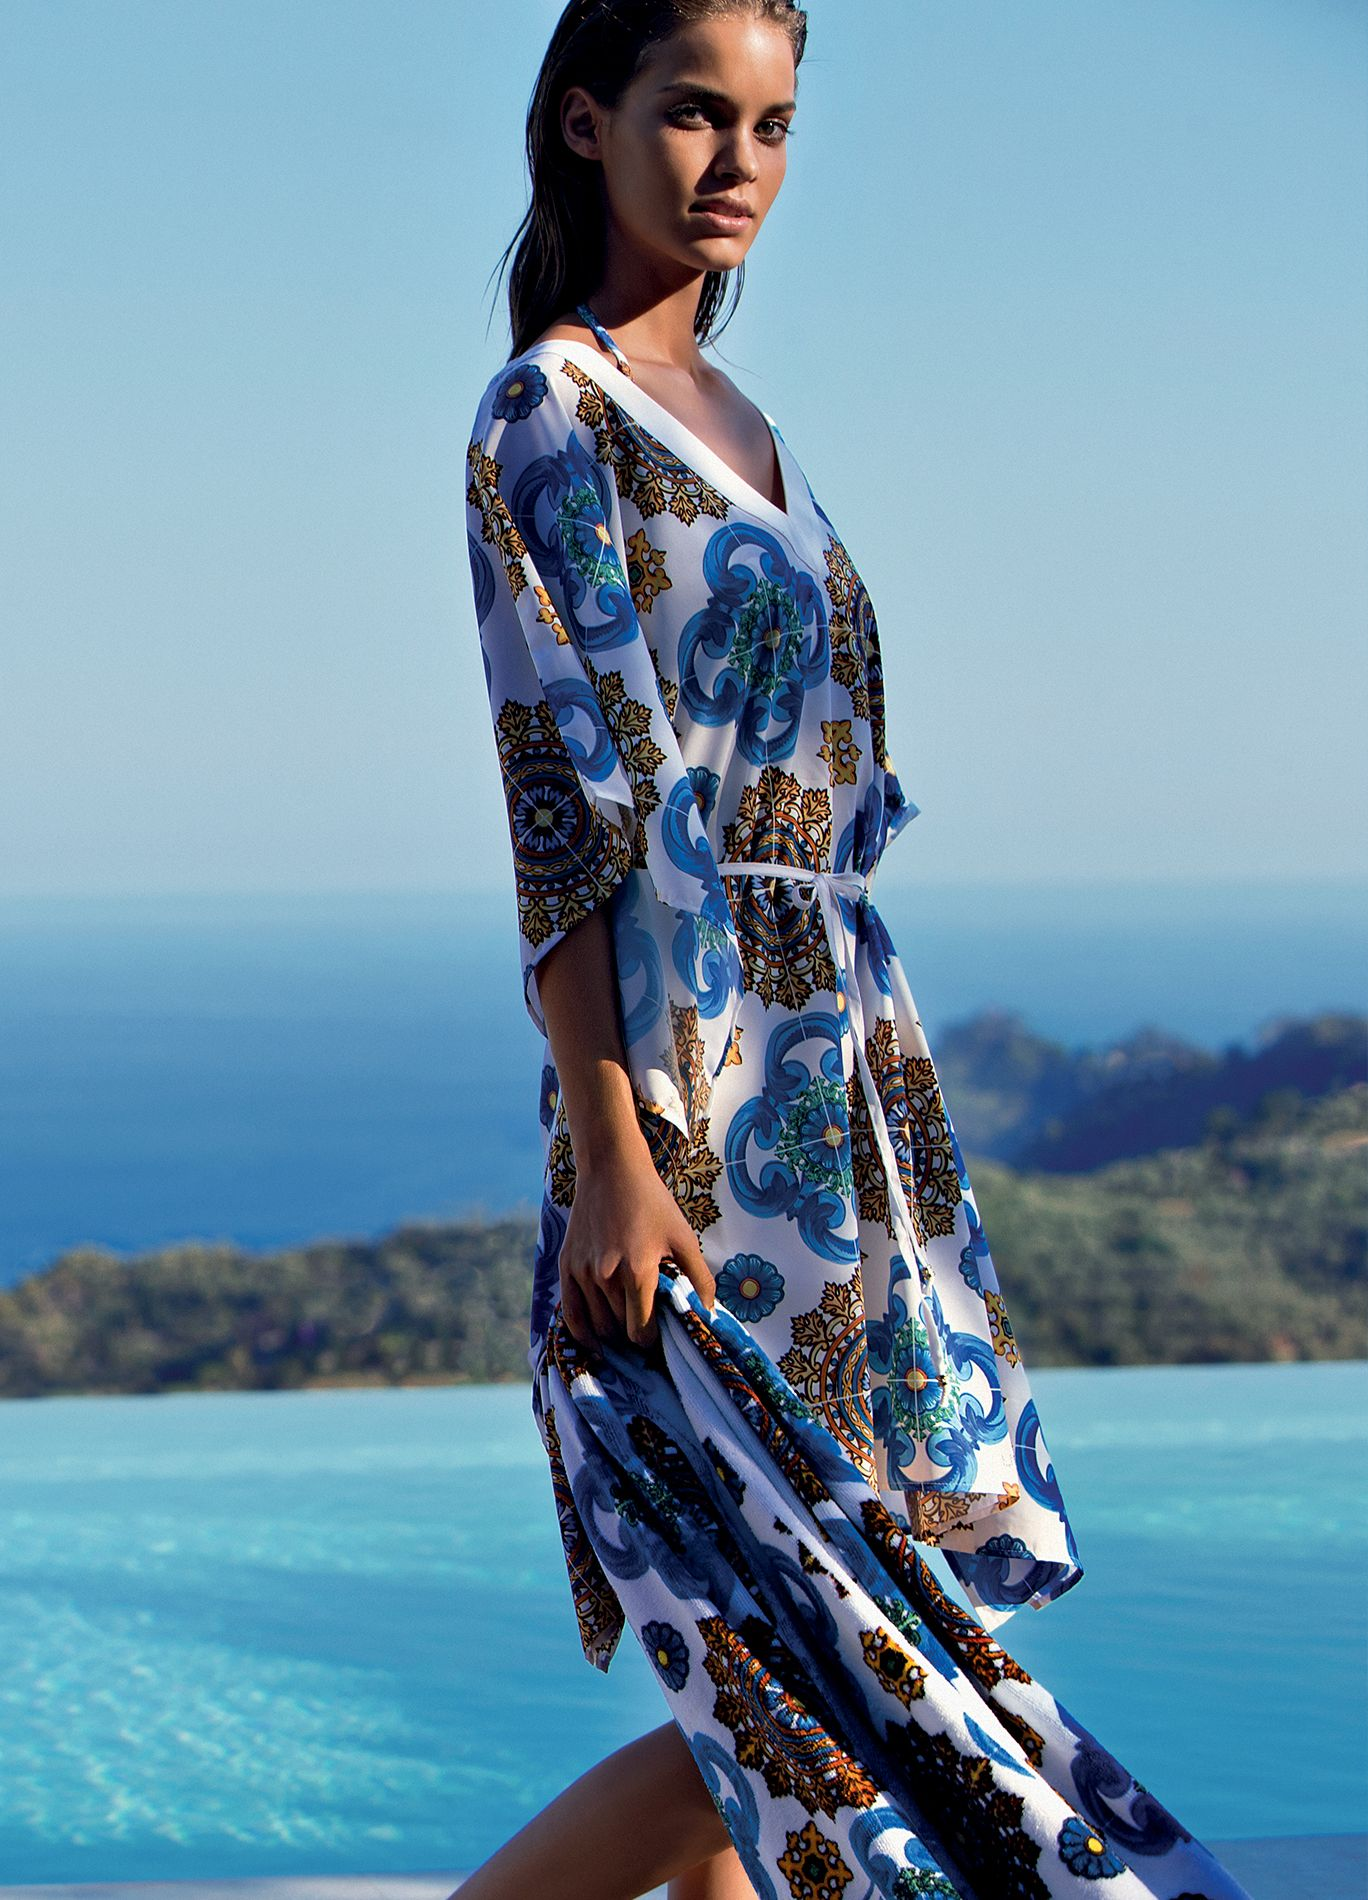 f6da8c0100 Liu Jo | Beachwear Spring Summer 2017 #LiuJo #Beachwear #Swimwear #Fashion  #Style #Summer